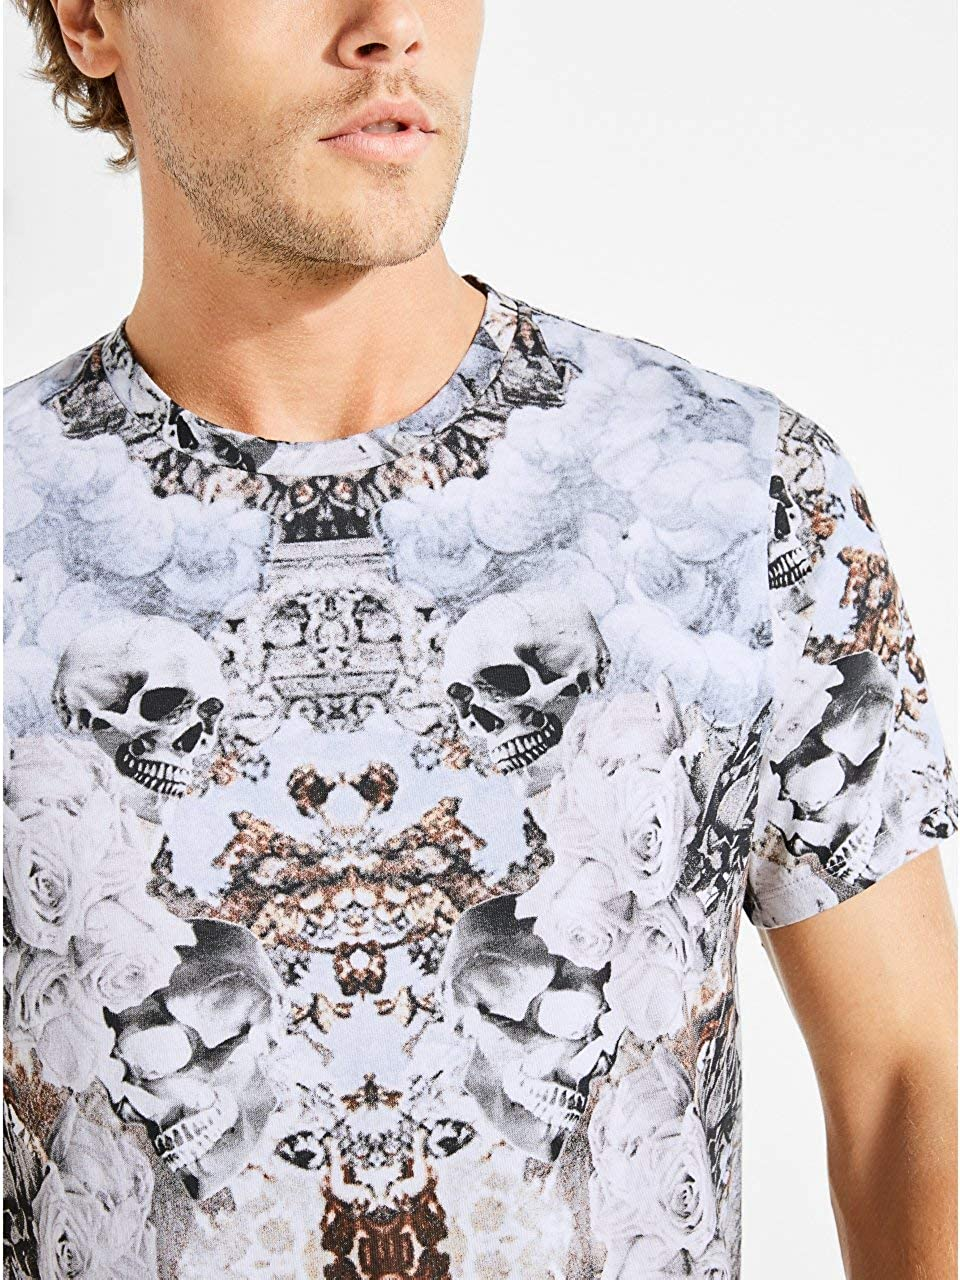 GUESS Mens Short Sleeve Dreams Crew Neck T-Shirt